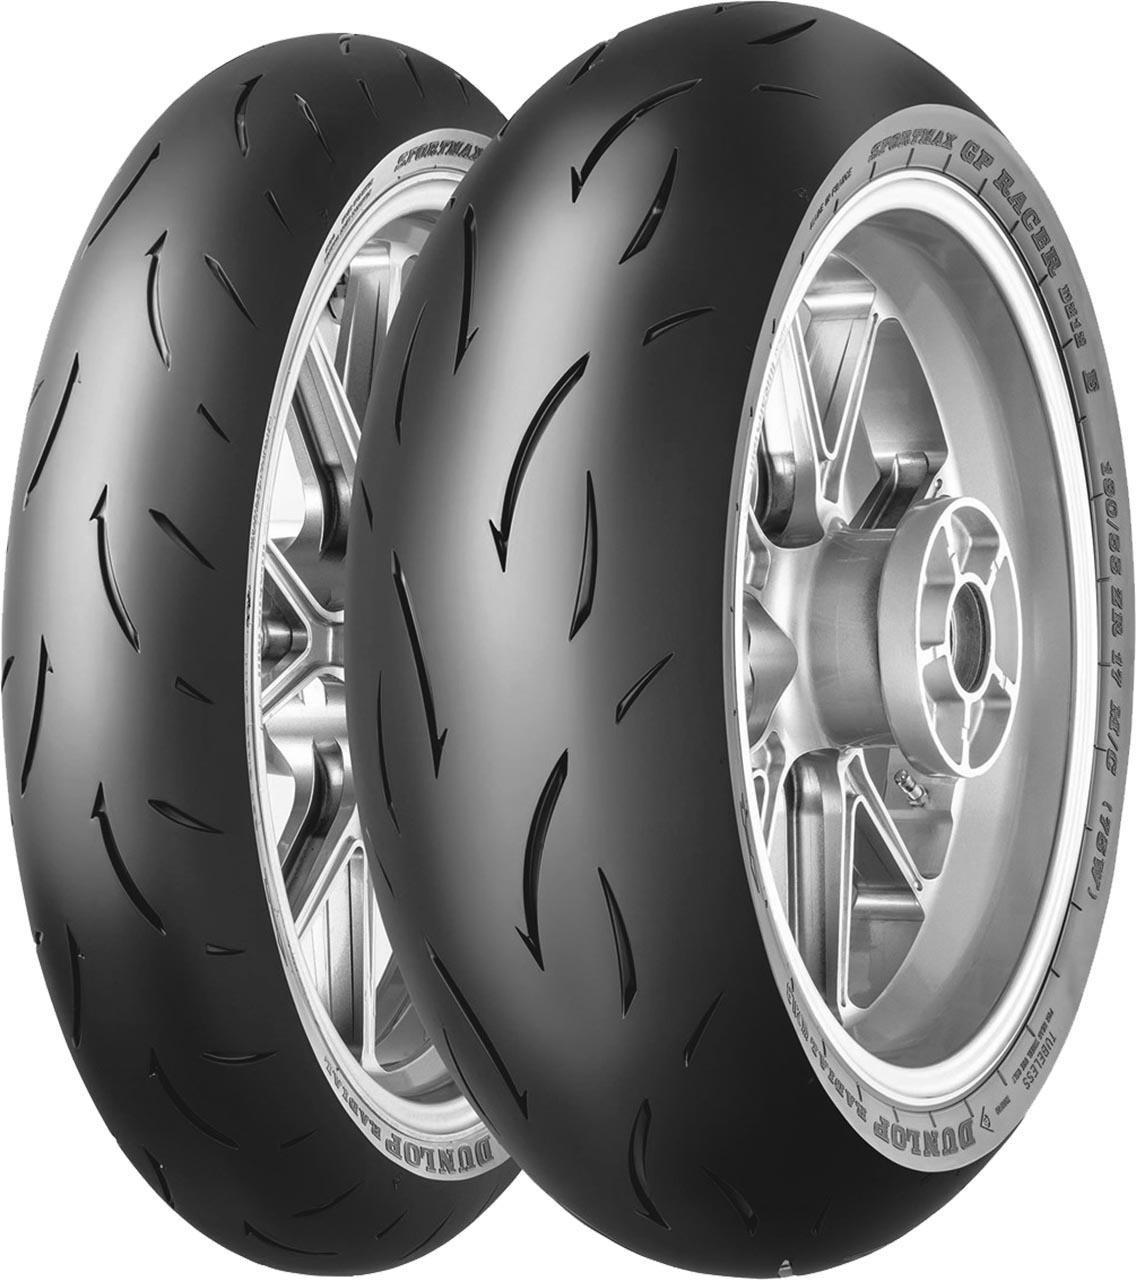 Dunlop Sportmax GP Racer D212 180/55 R17 73W M